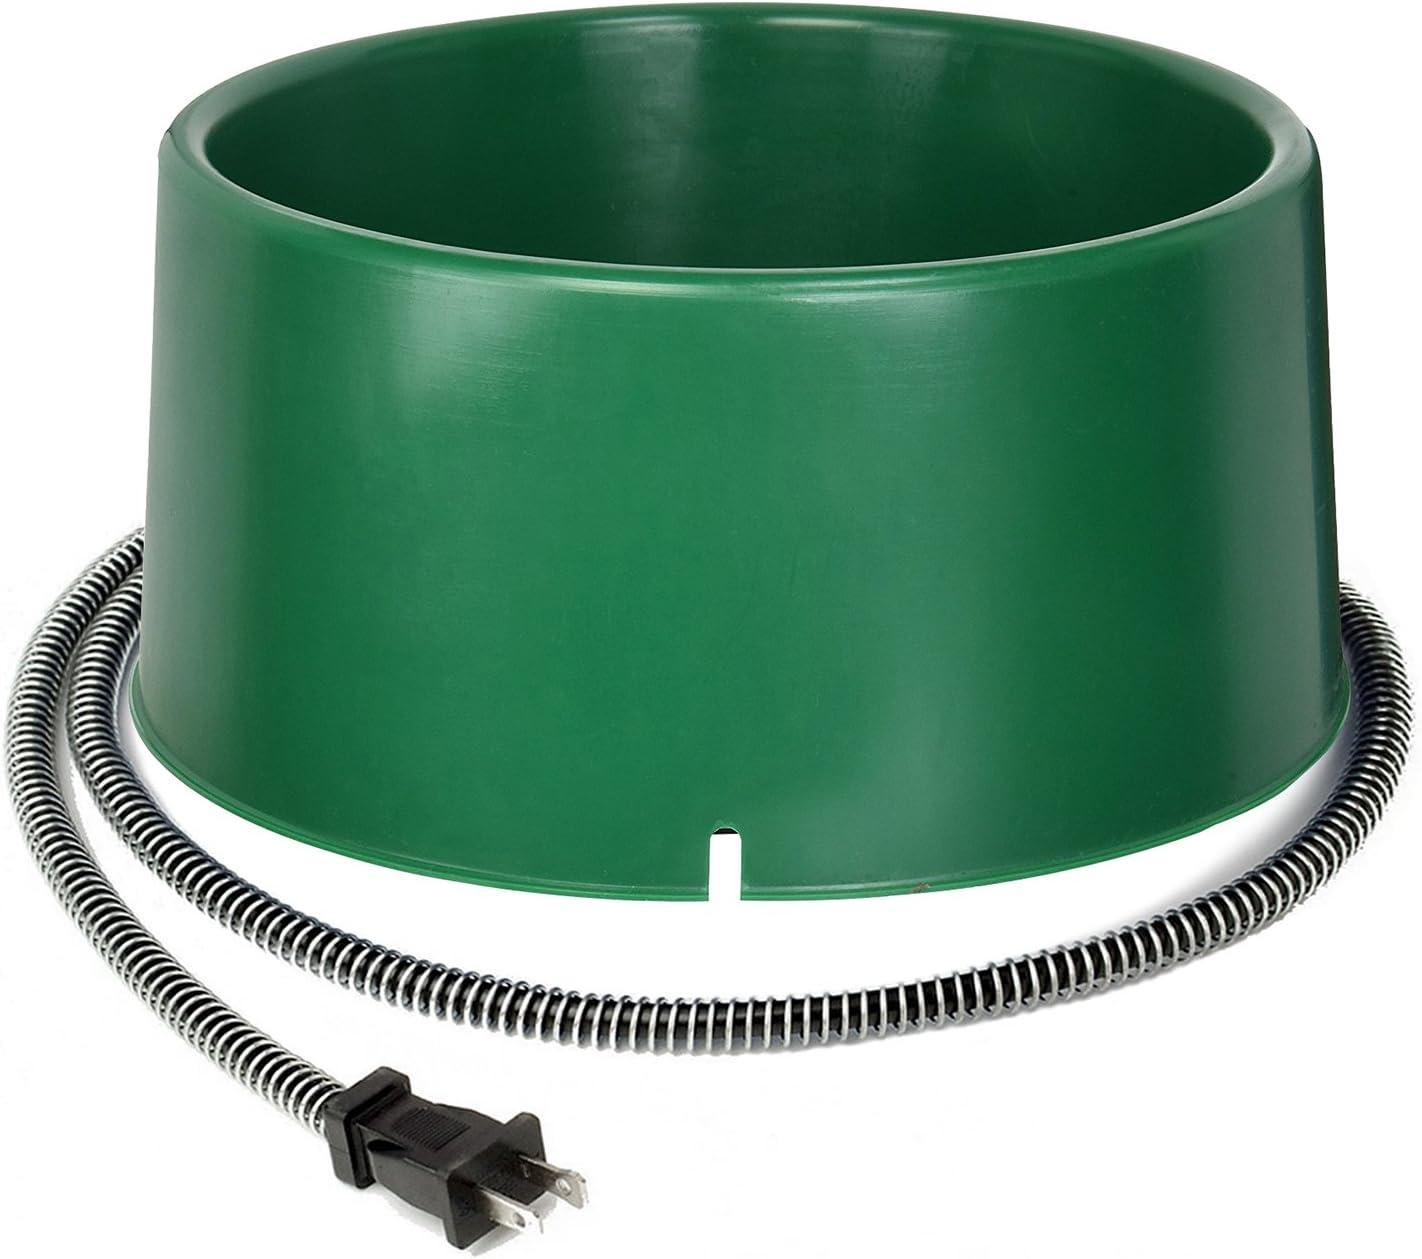 Farm Innovators 60-Watt 1.5 Gallon Heated Pet Bowl